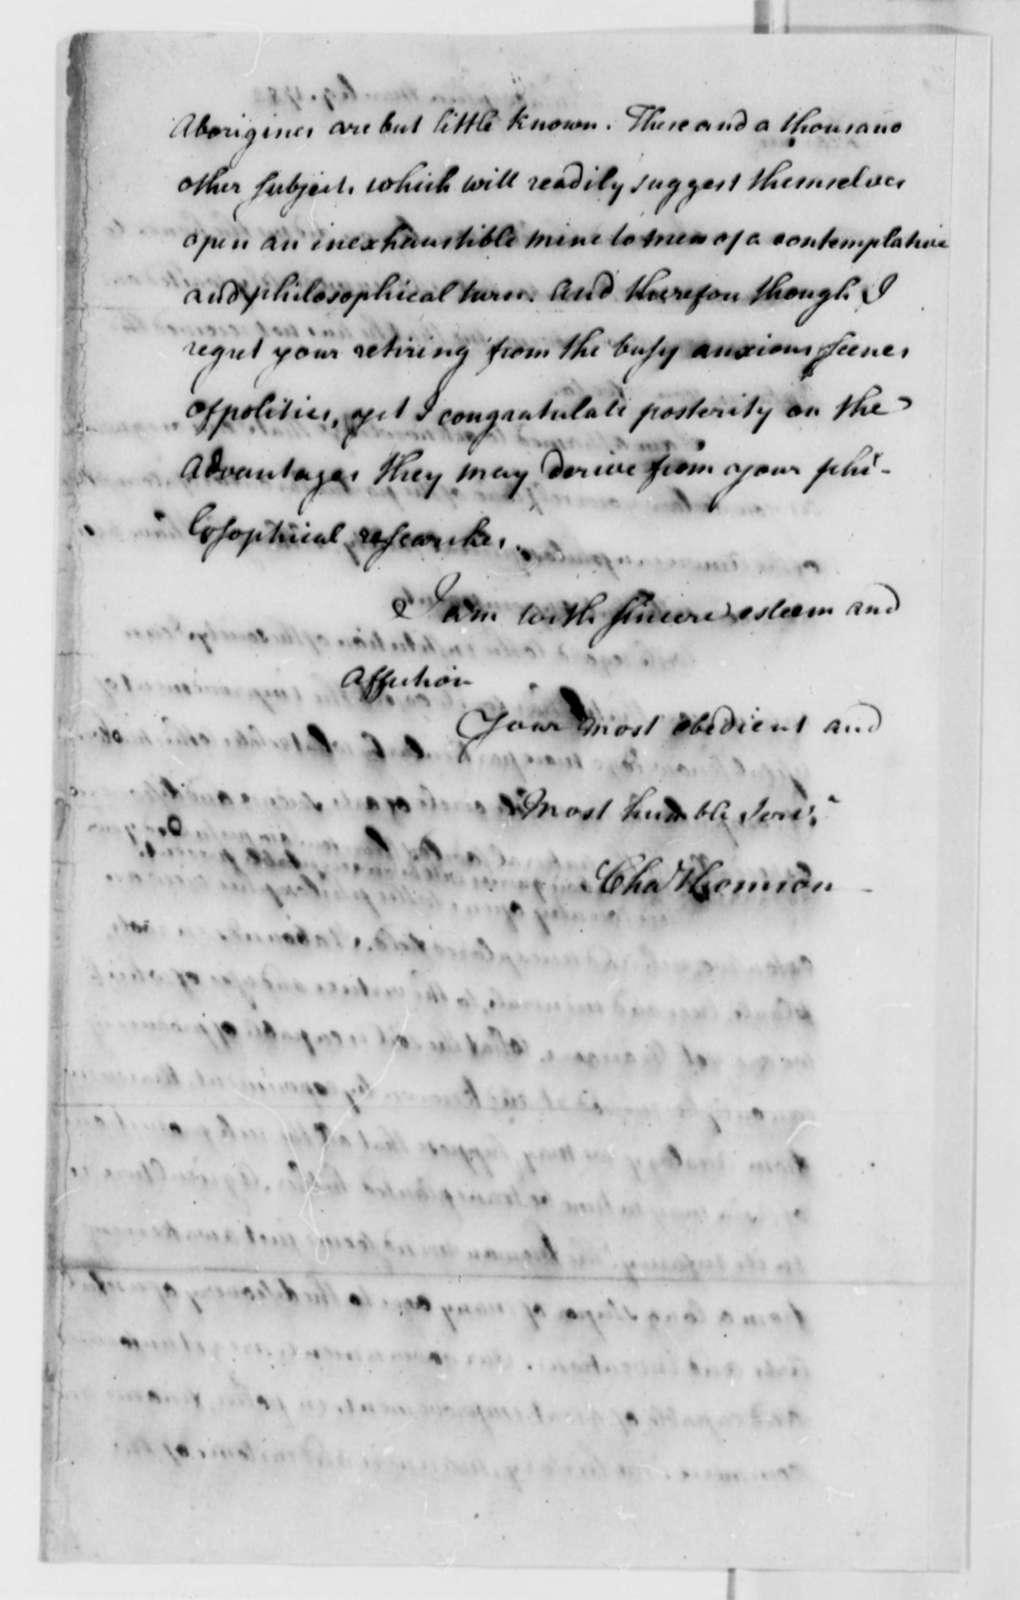 Charles Thomas to Thomas Jefferson, March 9, 1782